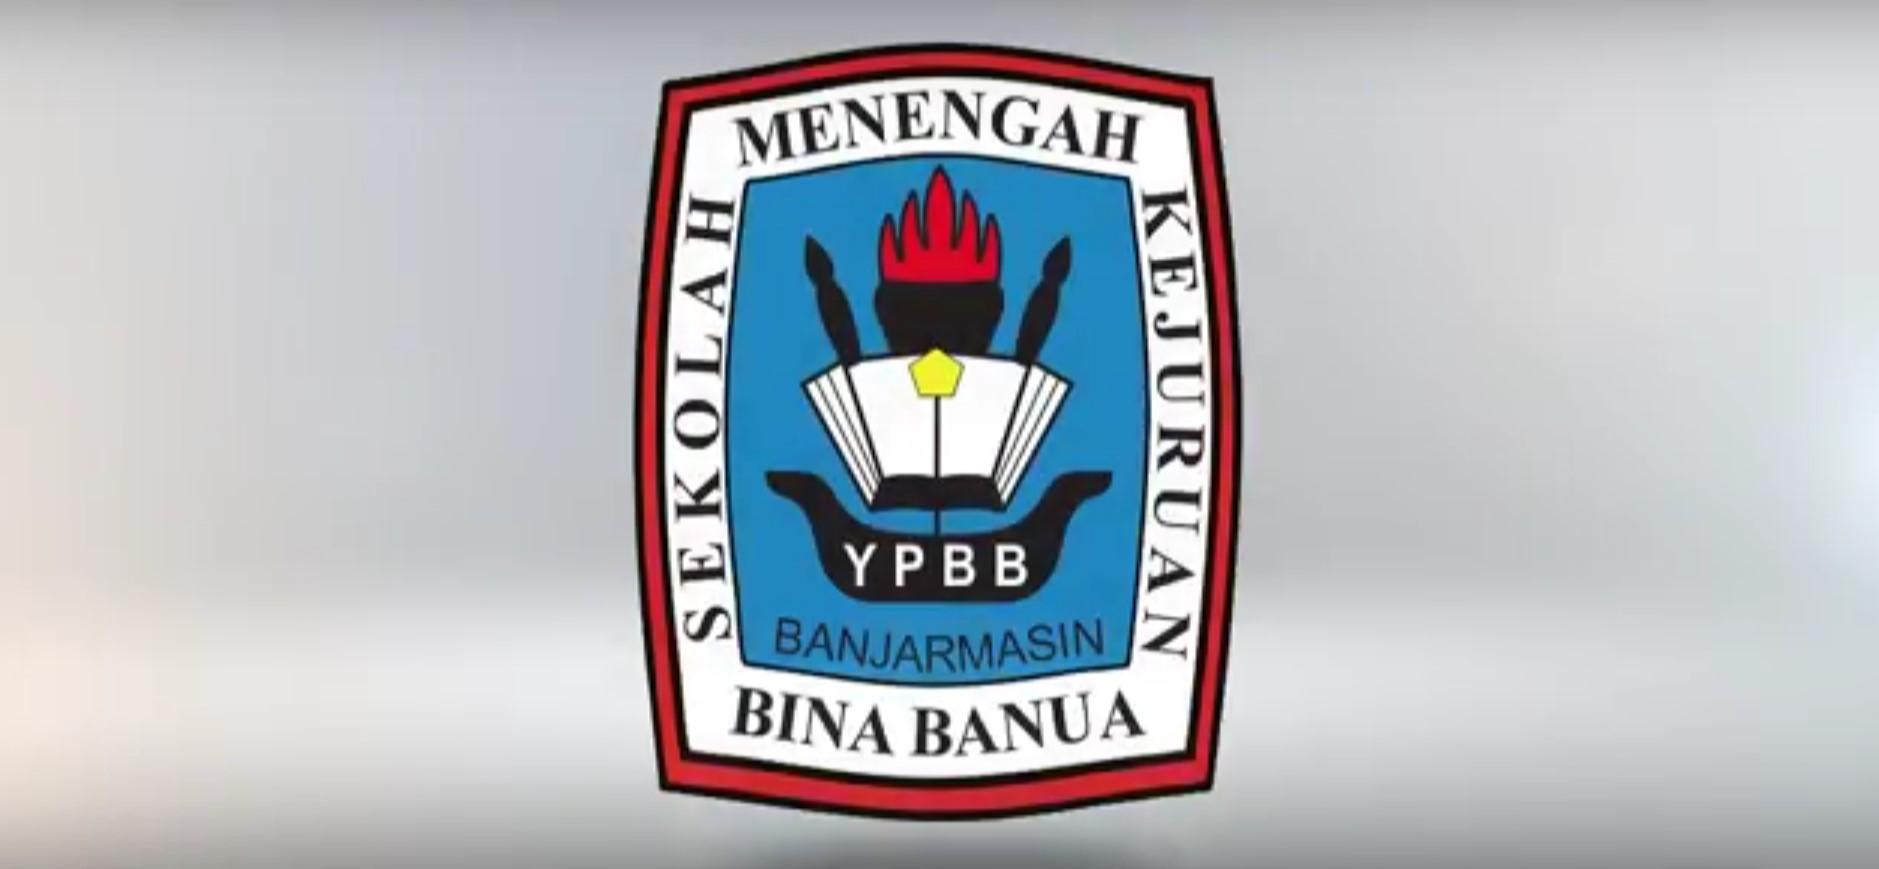 Rilis Video Profil SMK Bina Banua Banjarmasin